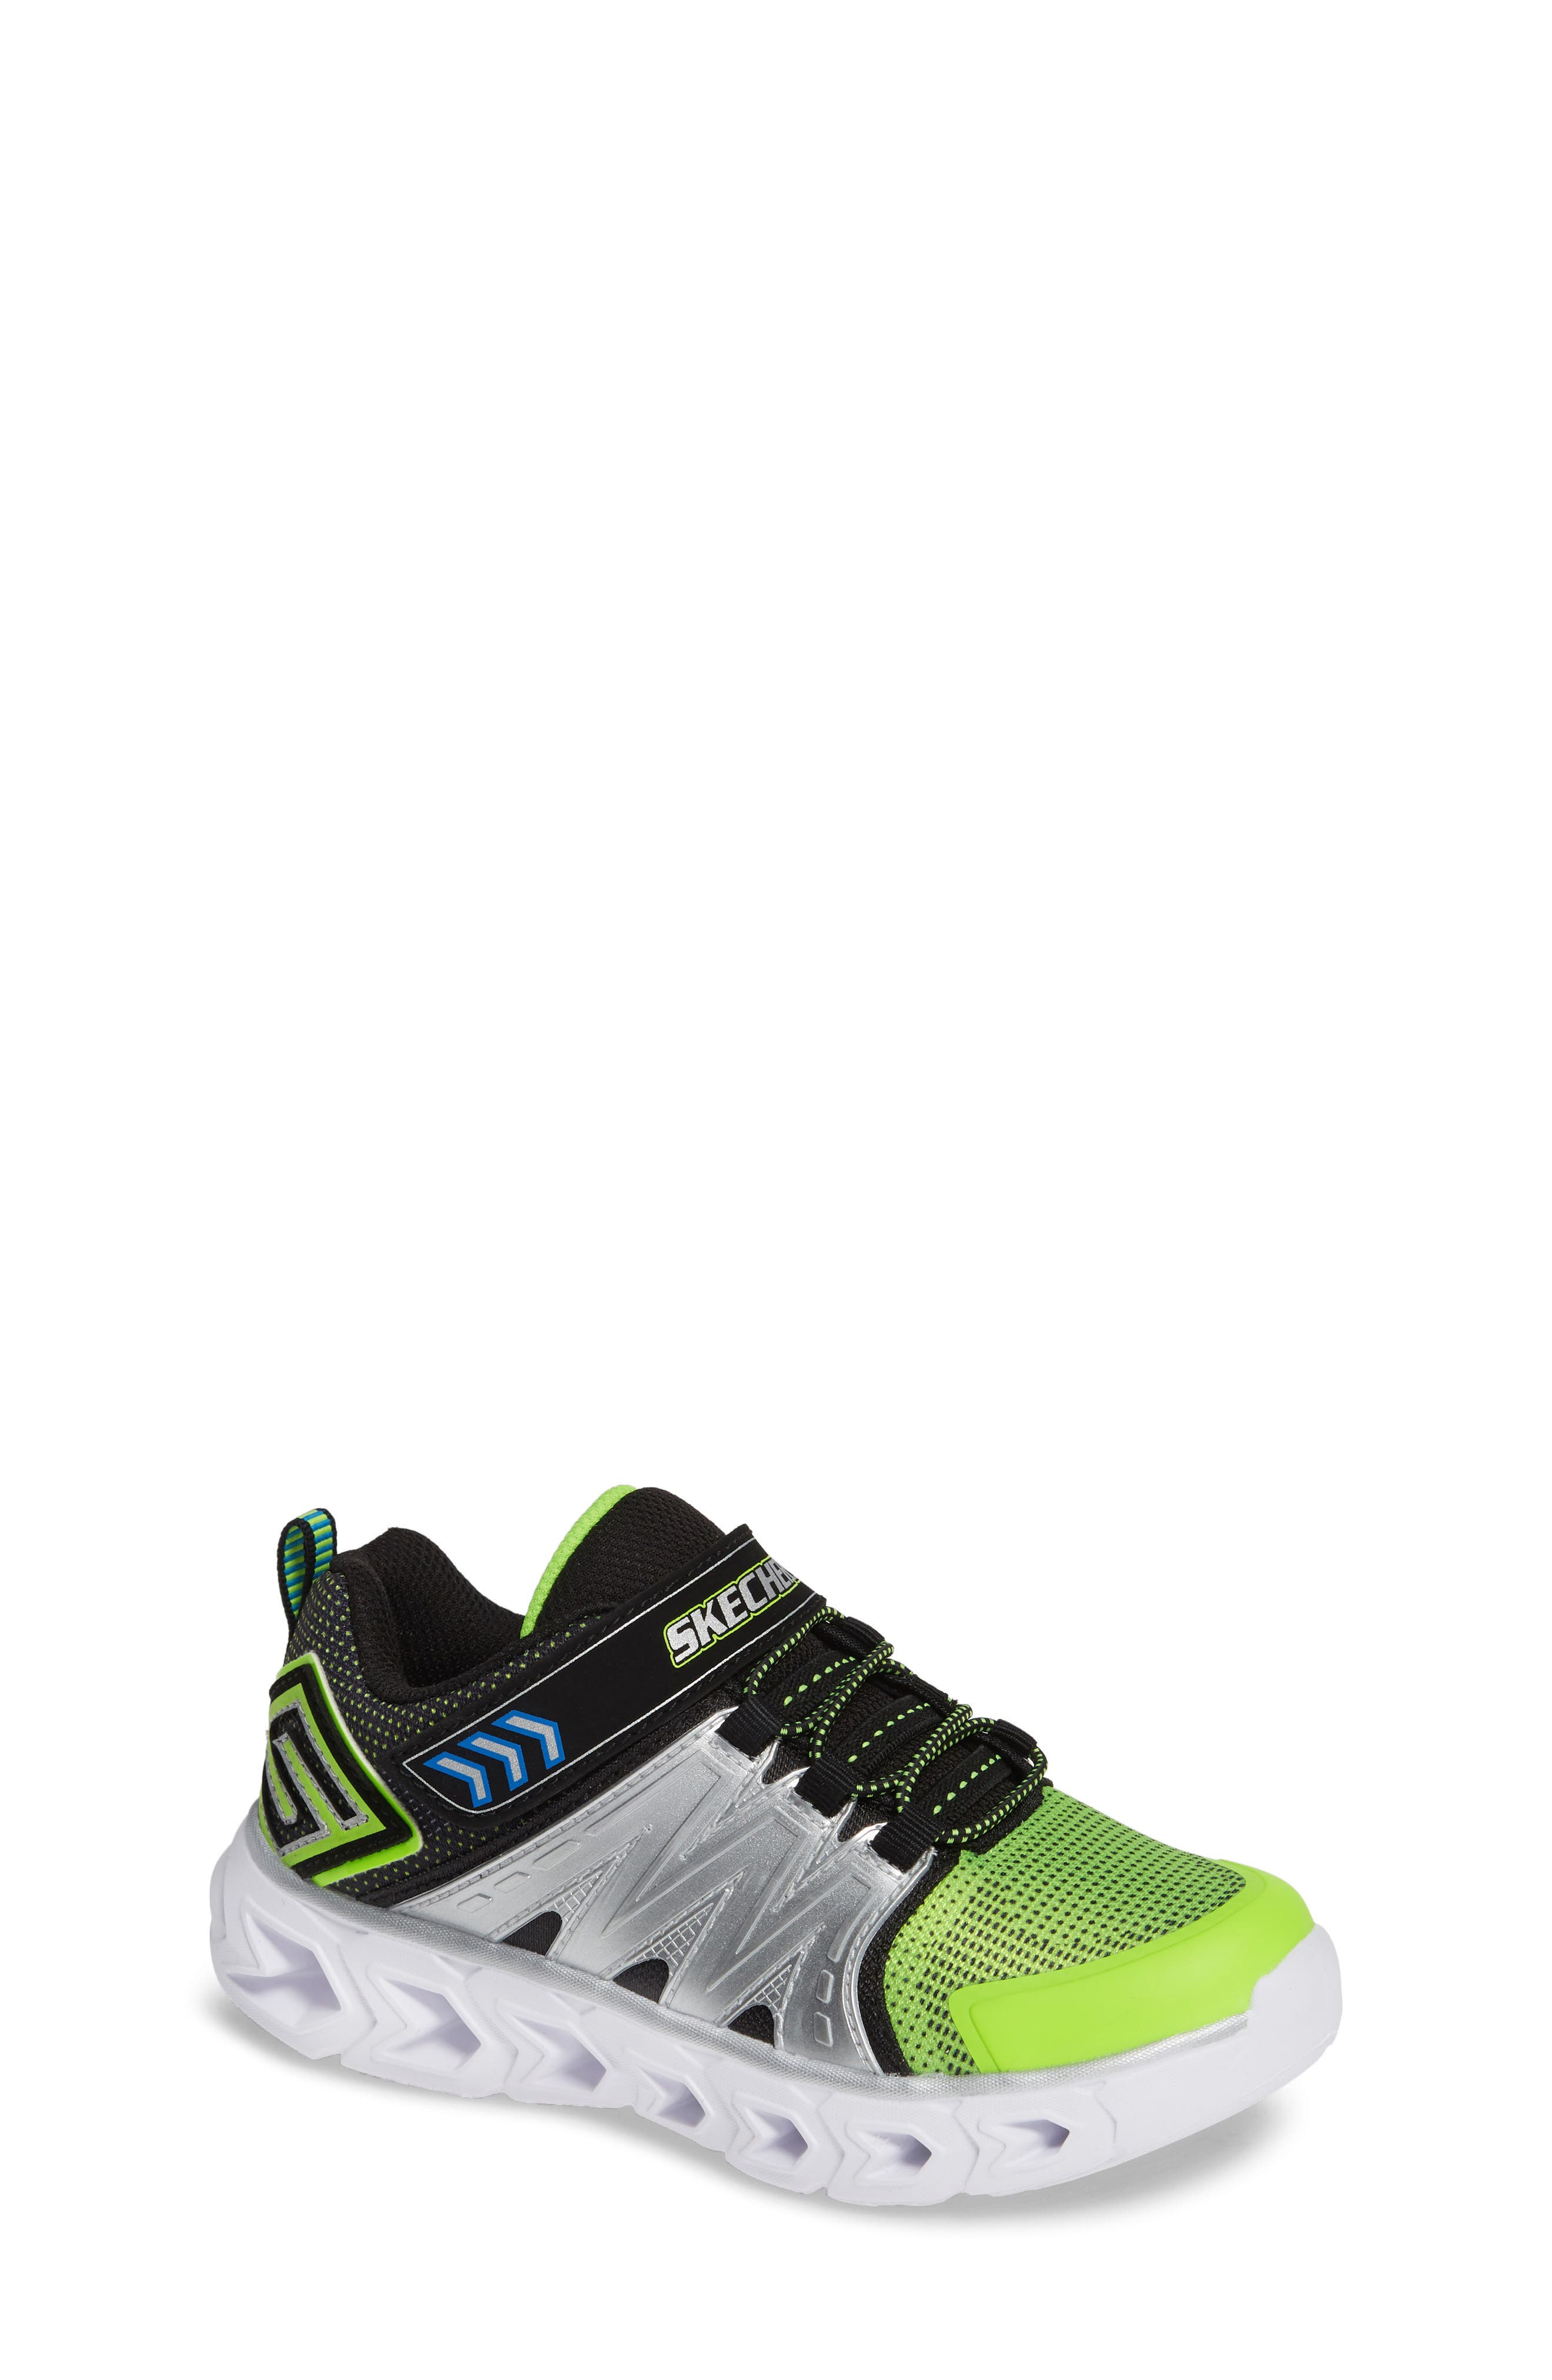 Hypno-Flash 2.0 Sneakers,                             Main thumbnail 1, color,                             Lime/ Black